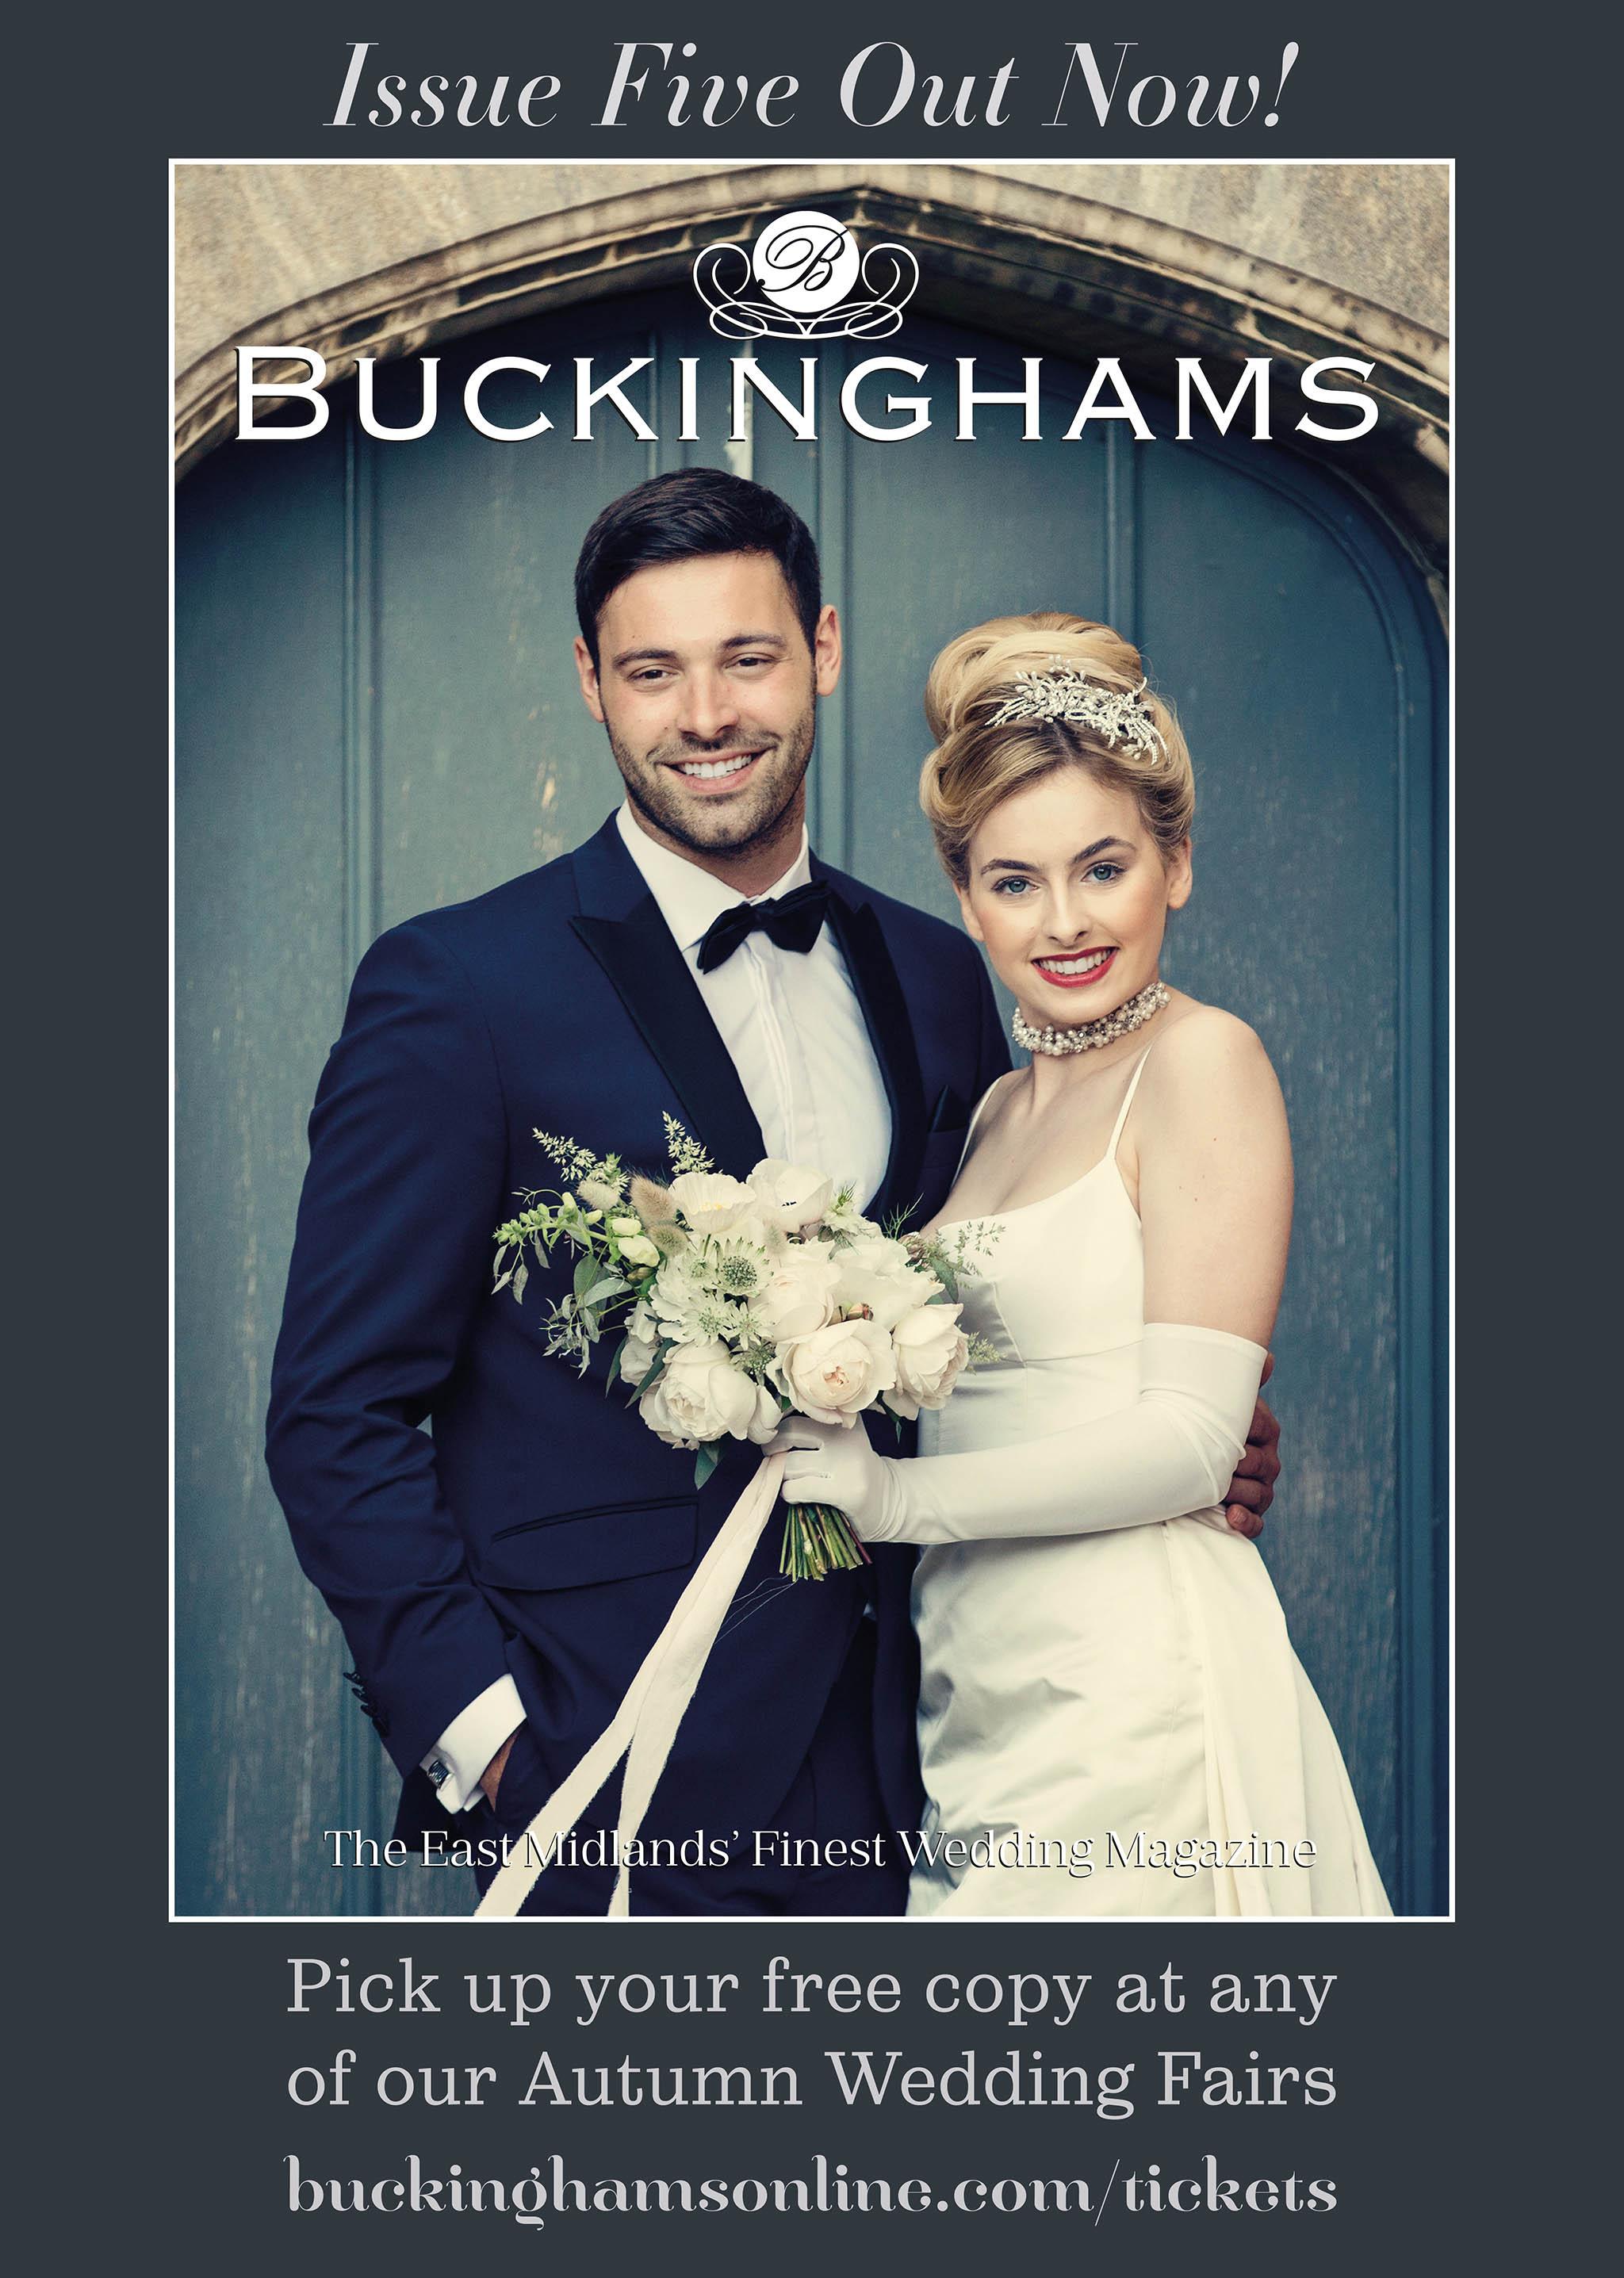 Buckinghams Wedding Magazine Issue 5 For The East Midlands